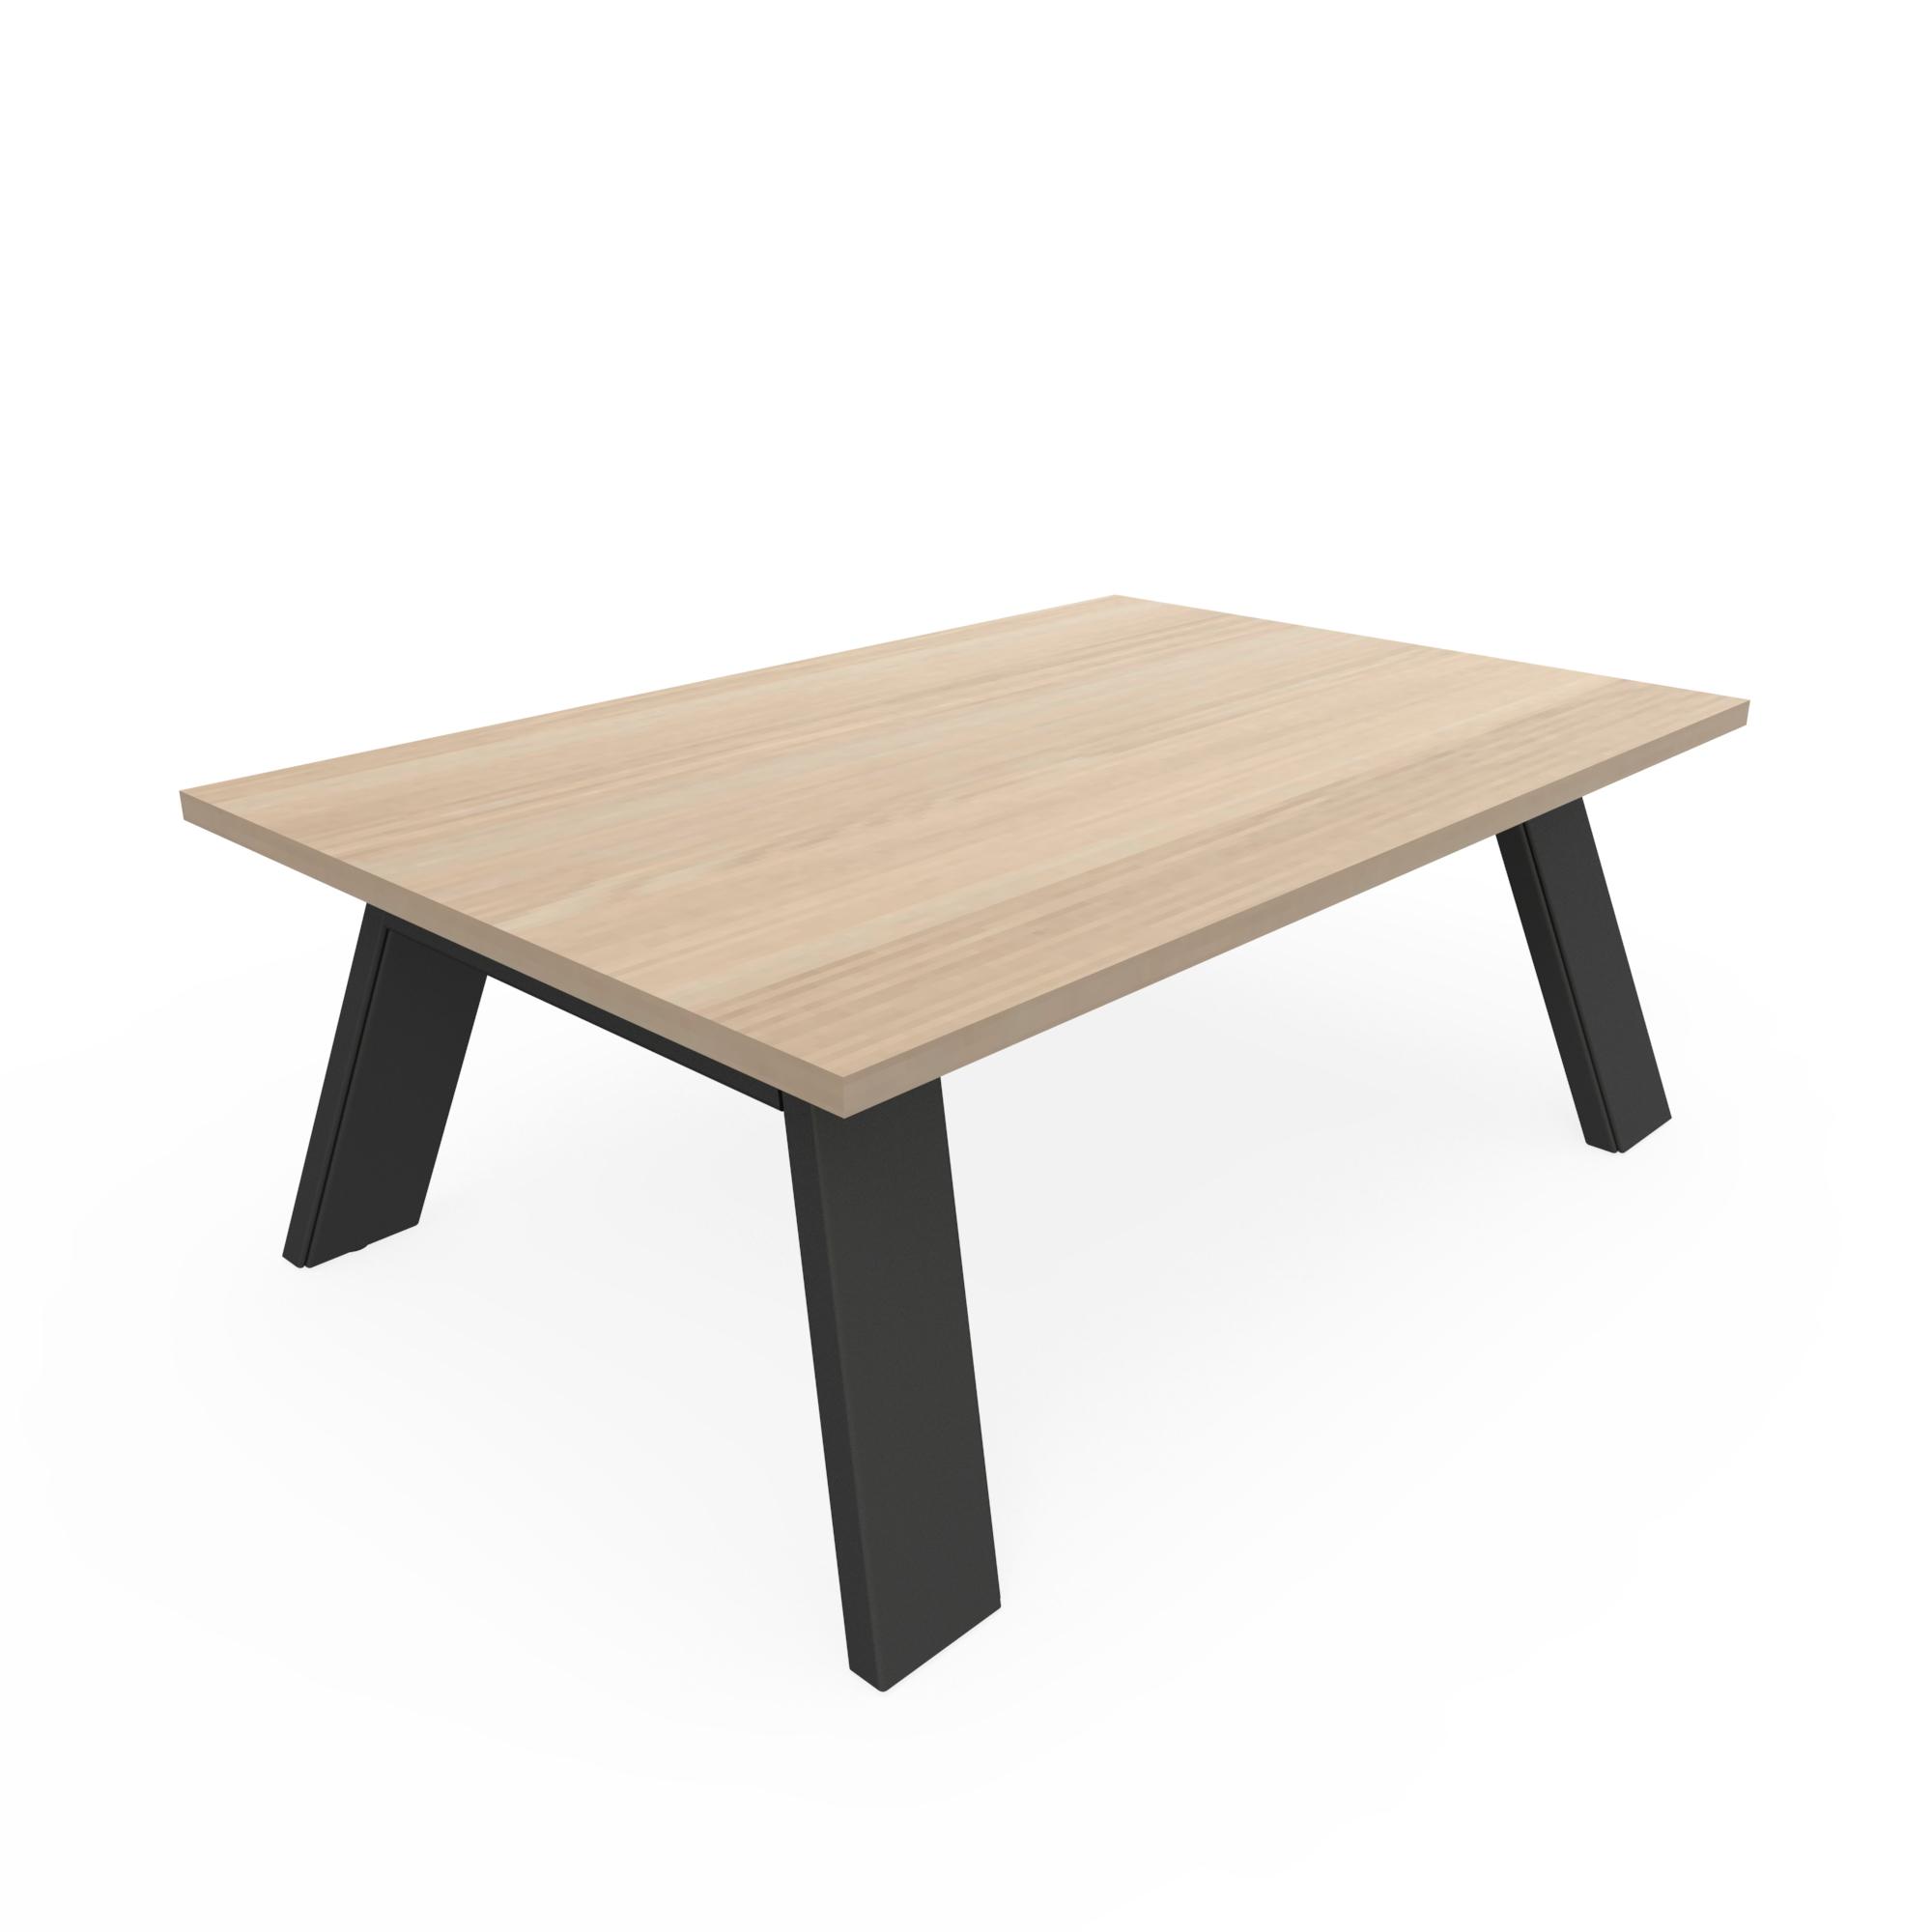 Fluoro Coffee Table Square In Matt White With Black Metal: Treto Coffee Tables